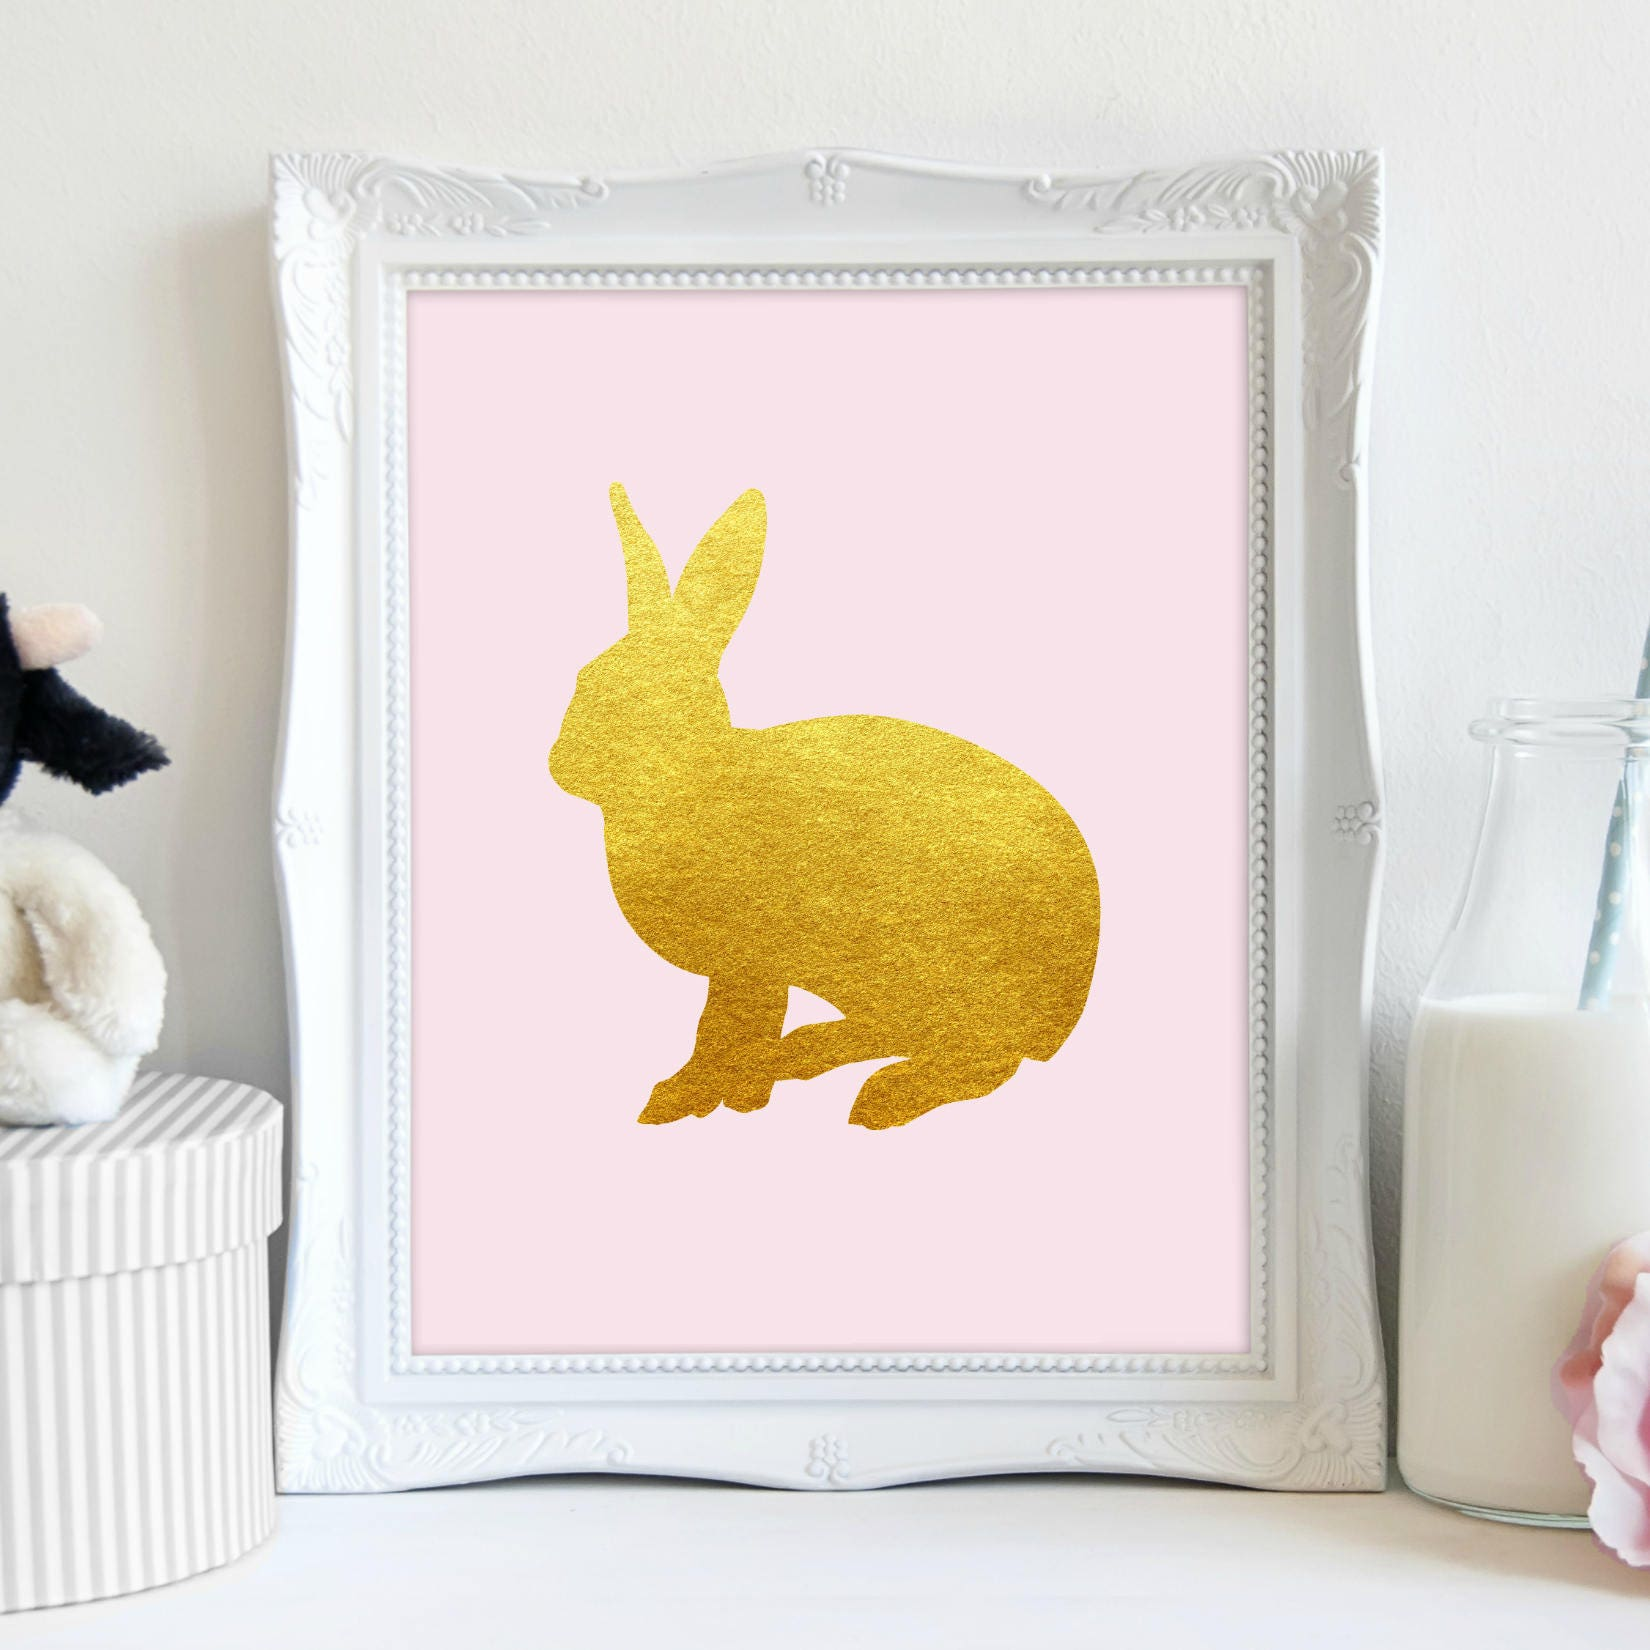 Enchanting Bunny Wall Decor Composition - Wall Art Collections ...